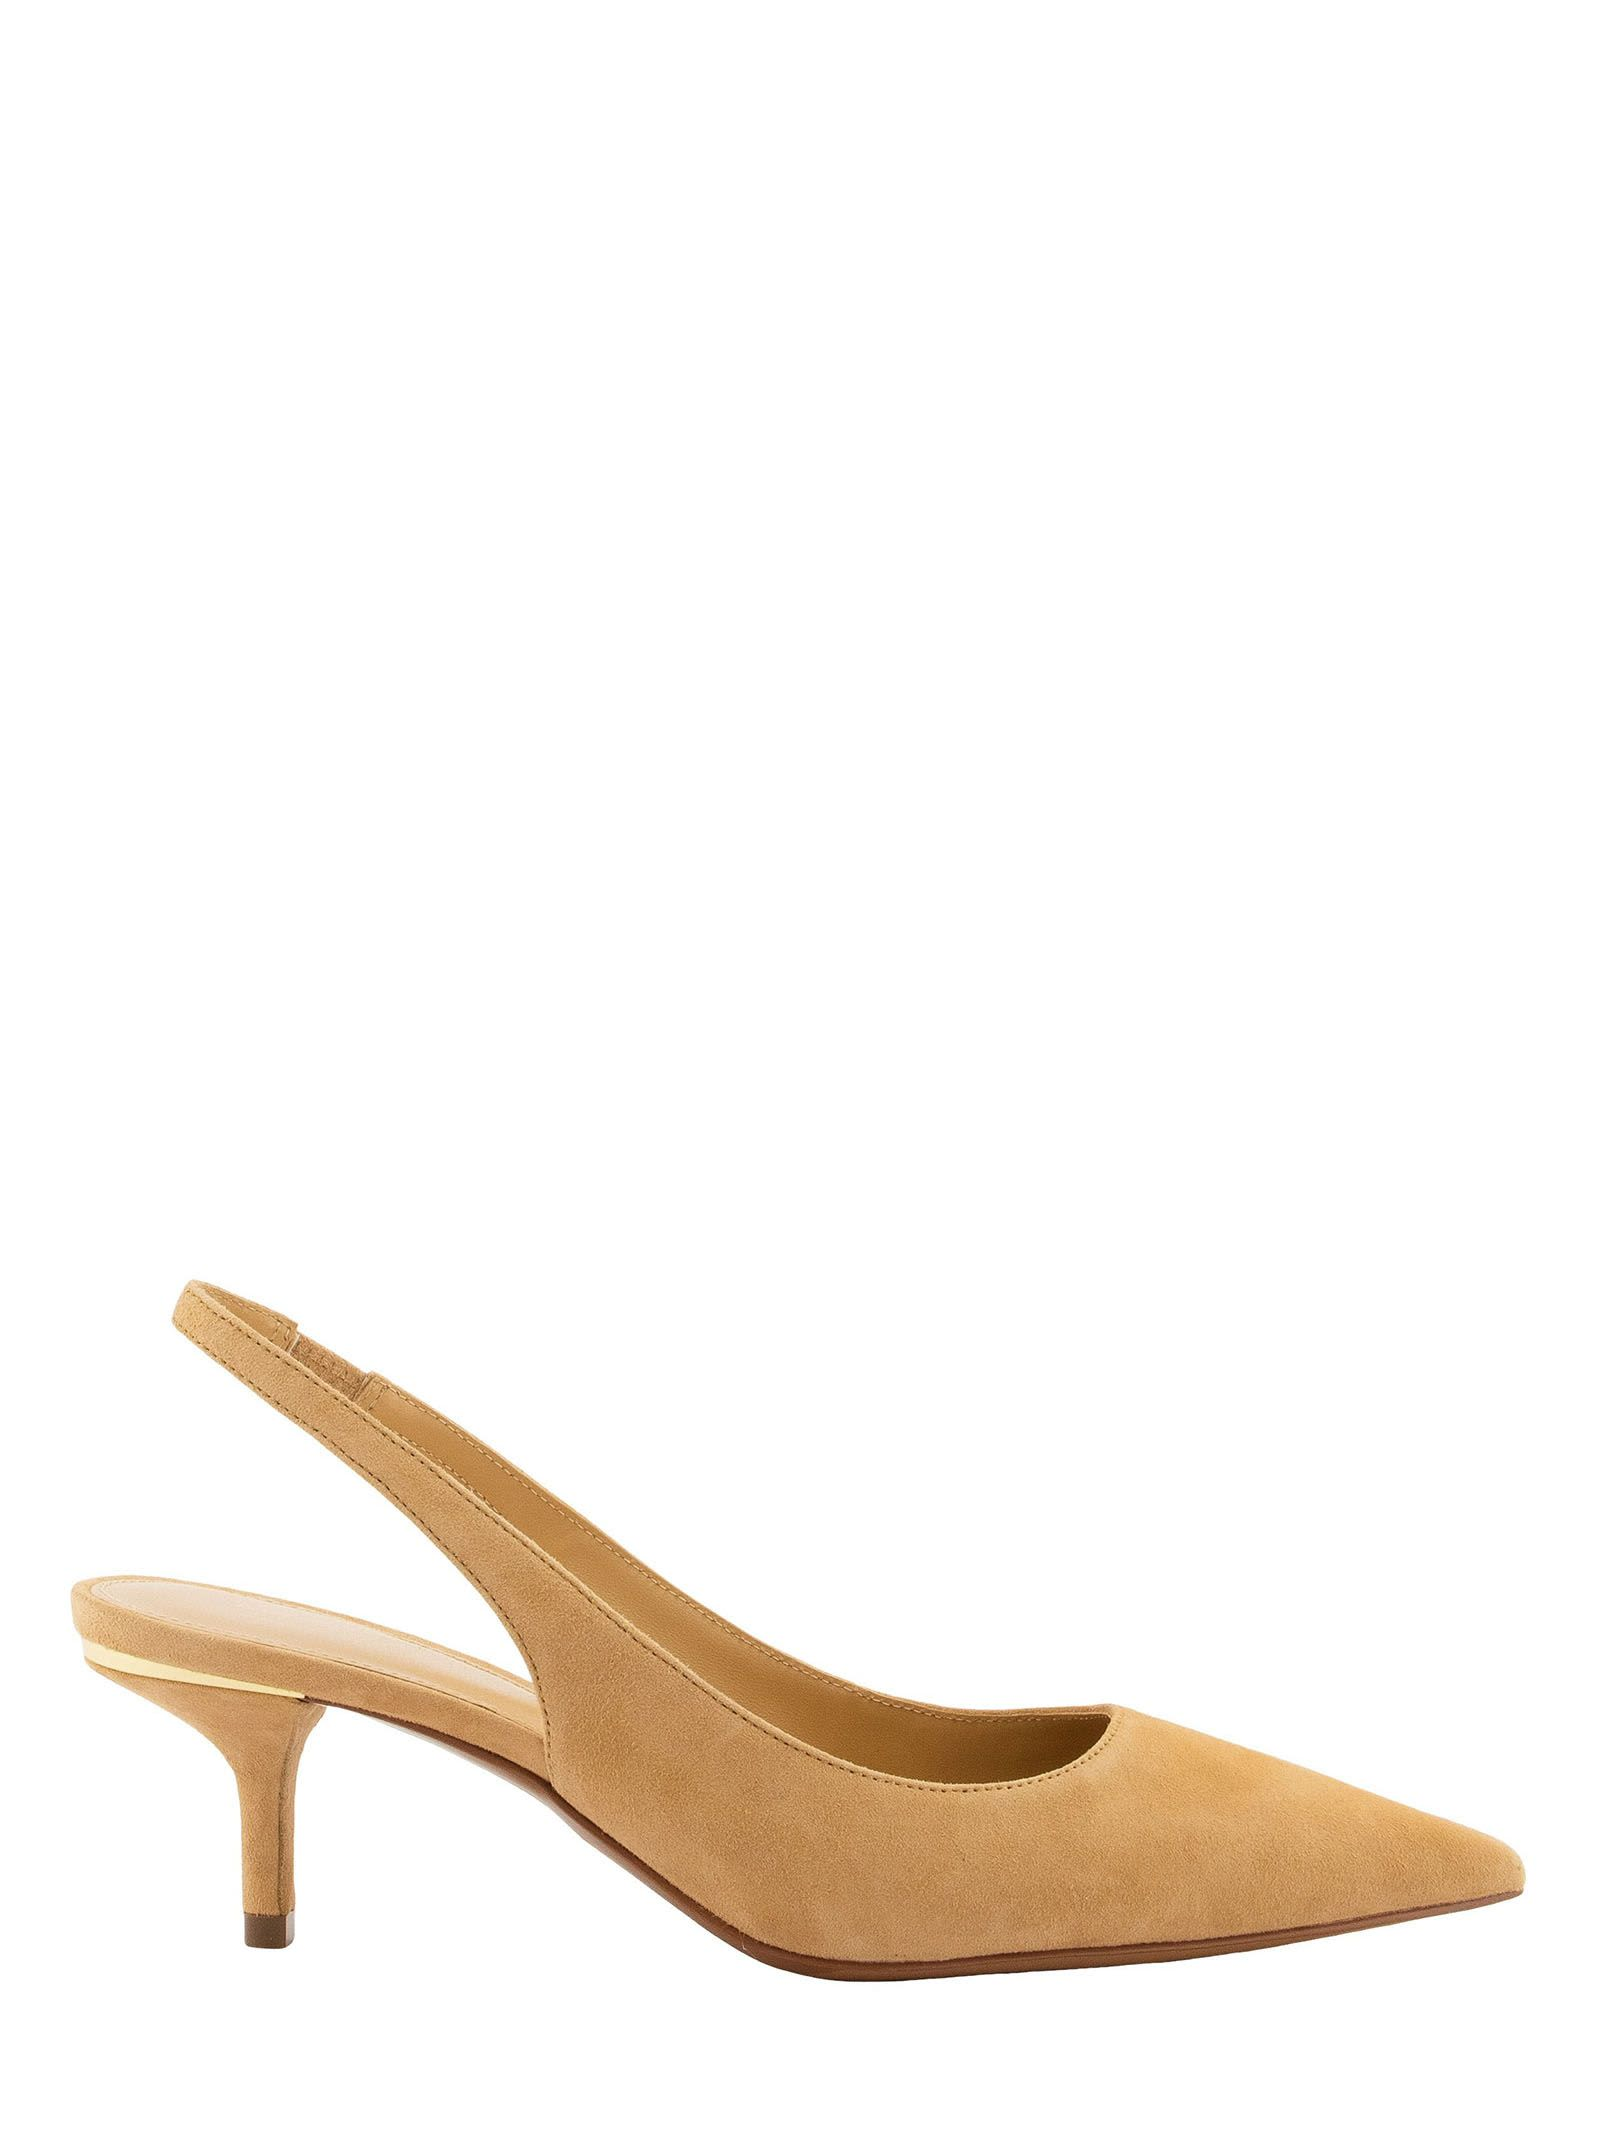 Michael Kors Sandal In Suede Sandals